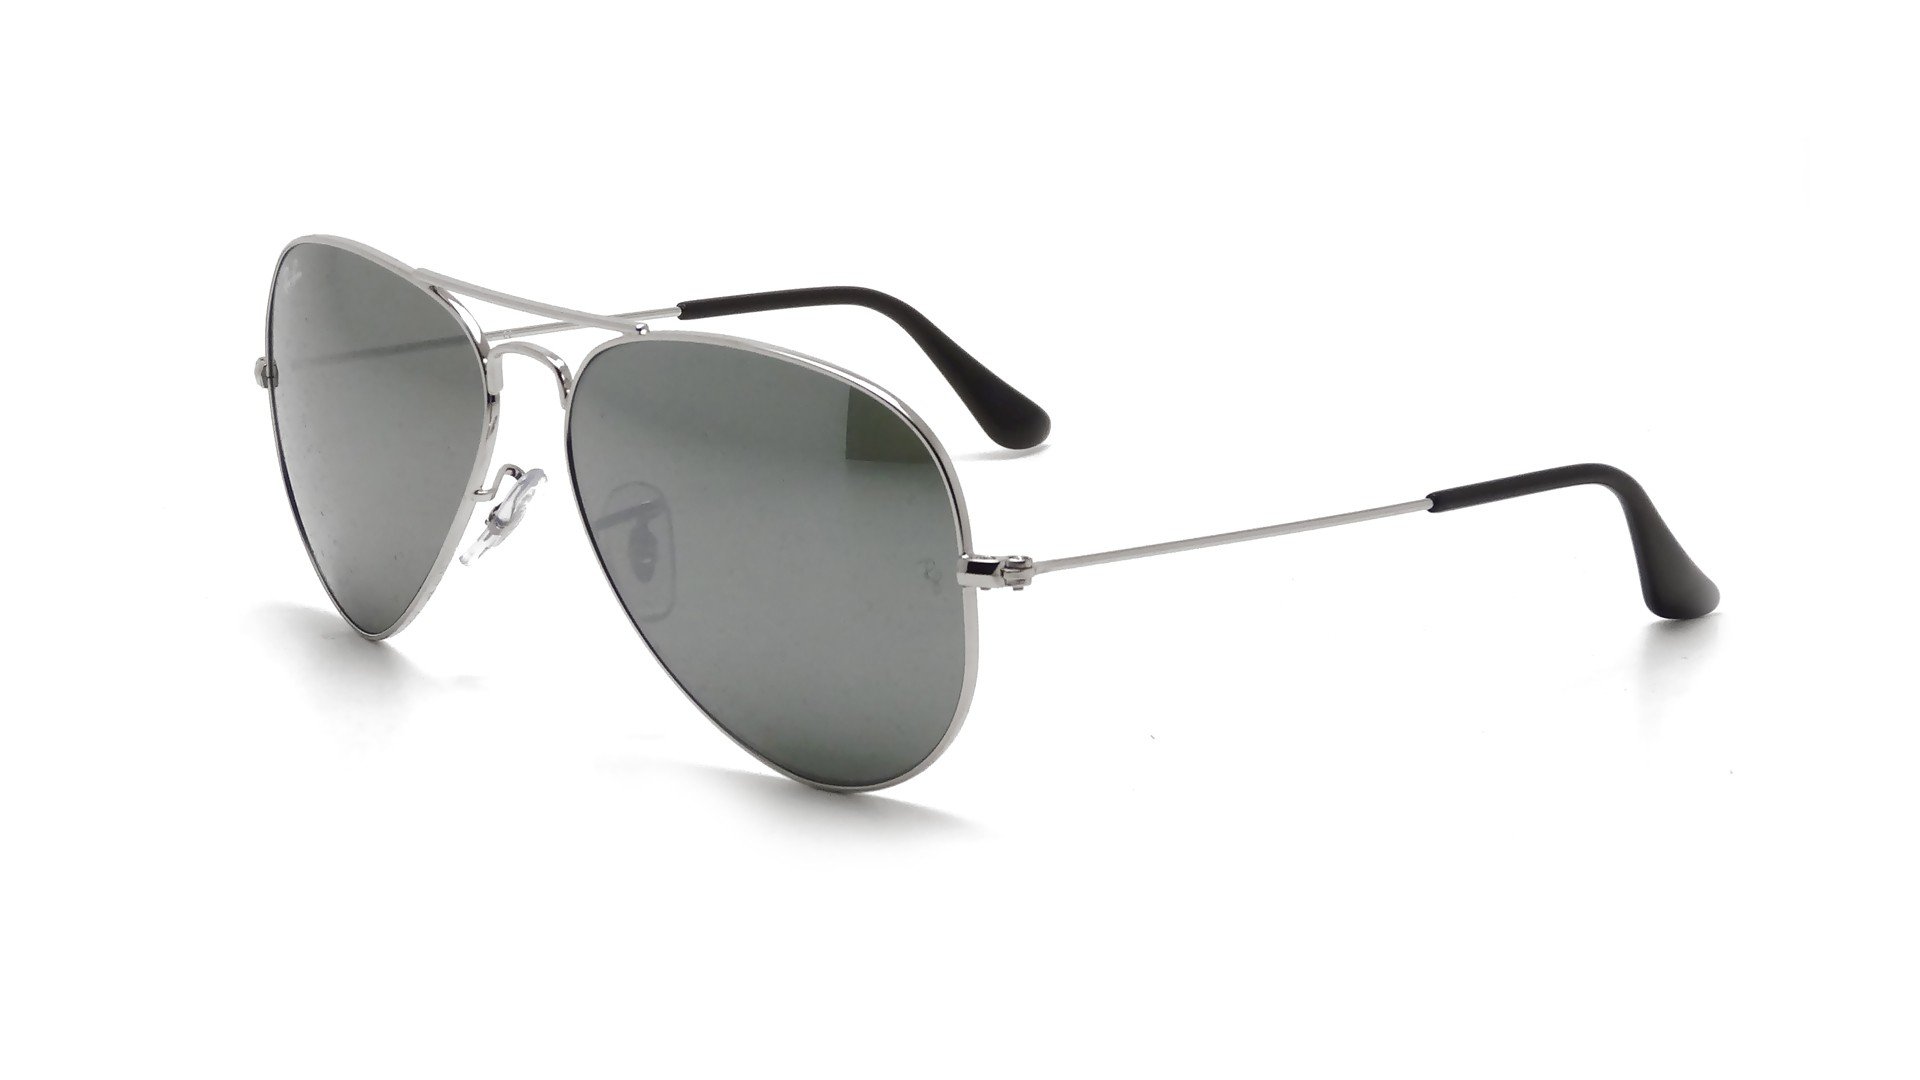 ray ban aviator sunglasses rb3025 w3277 silver mirror